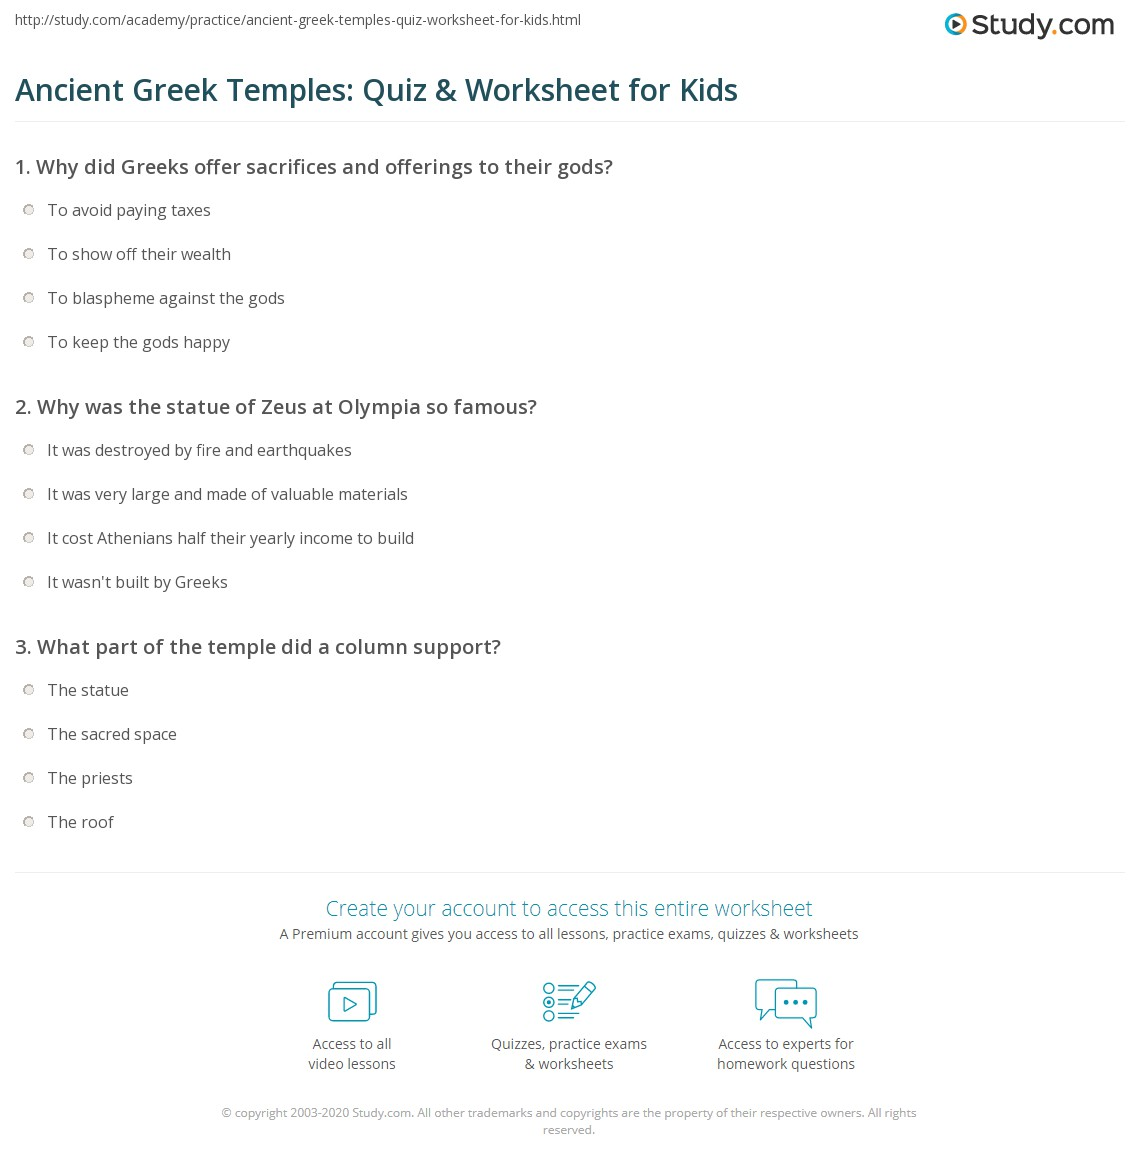 Ancient Greek Temples Quiz Amp Worksheet For Kids